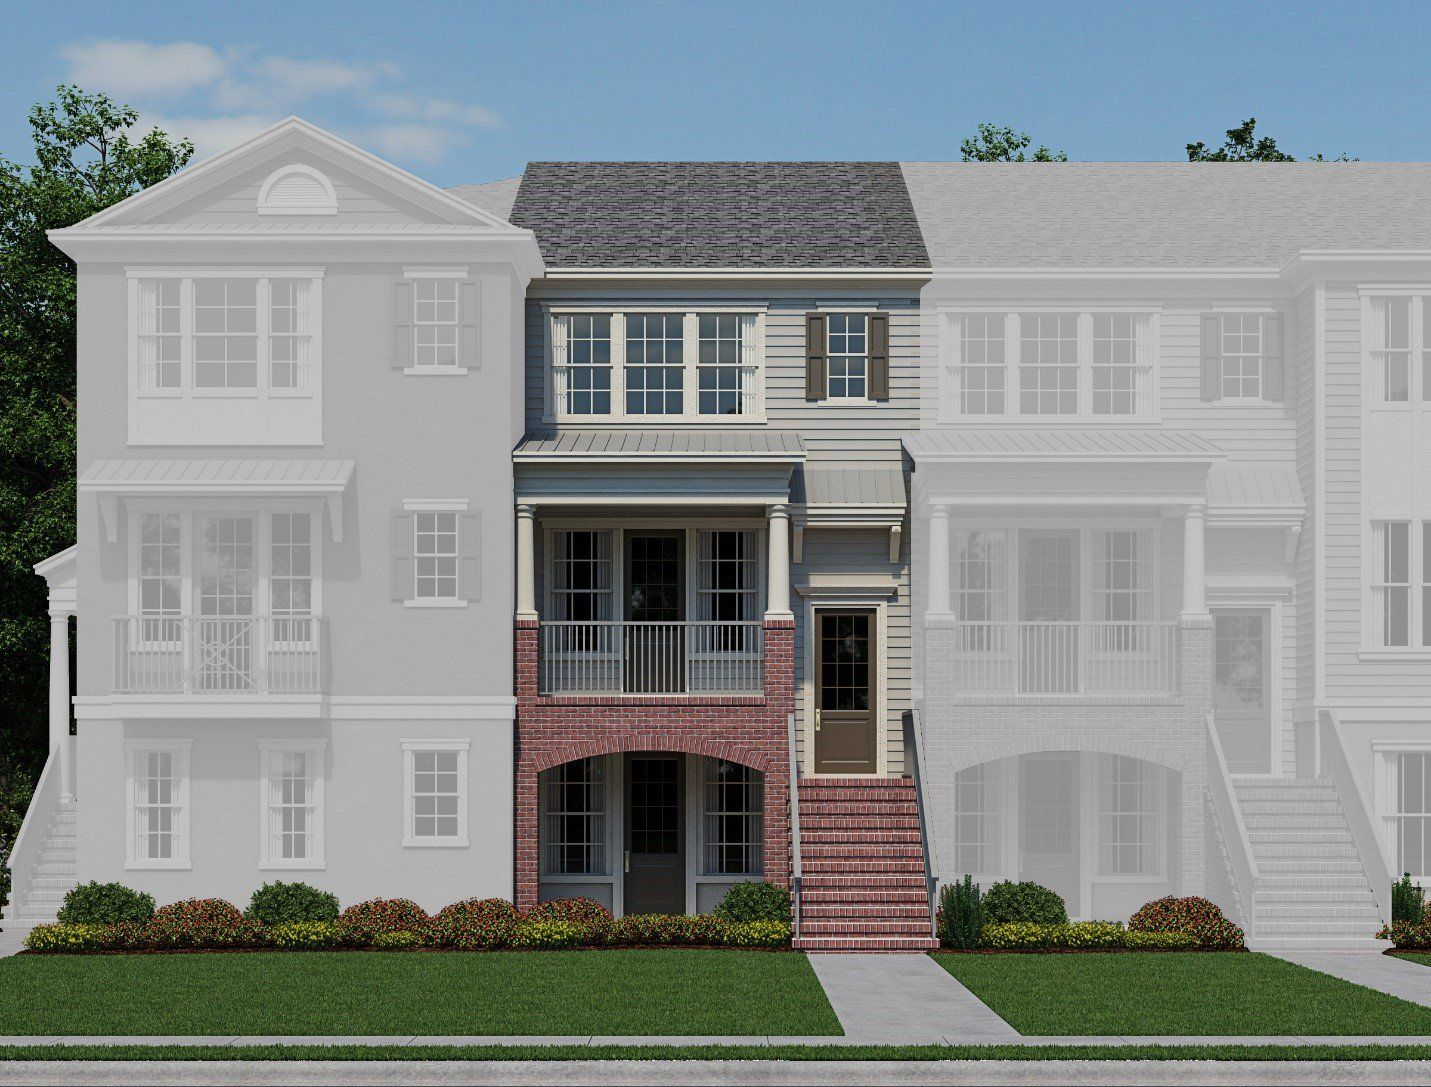 792 Castellon Way, Oviedo, FL Homes & Land - Real Estate